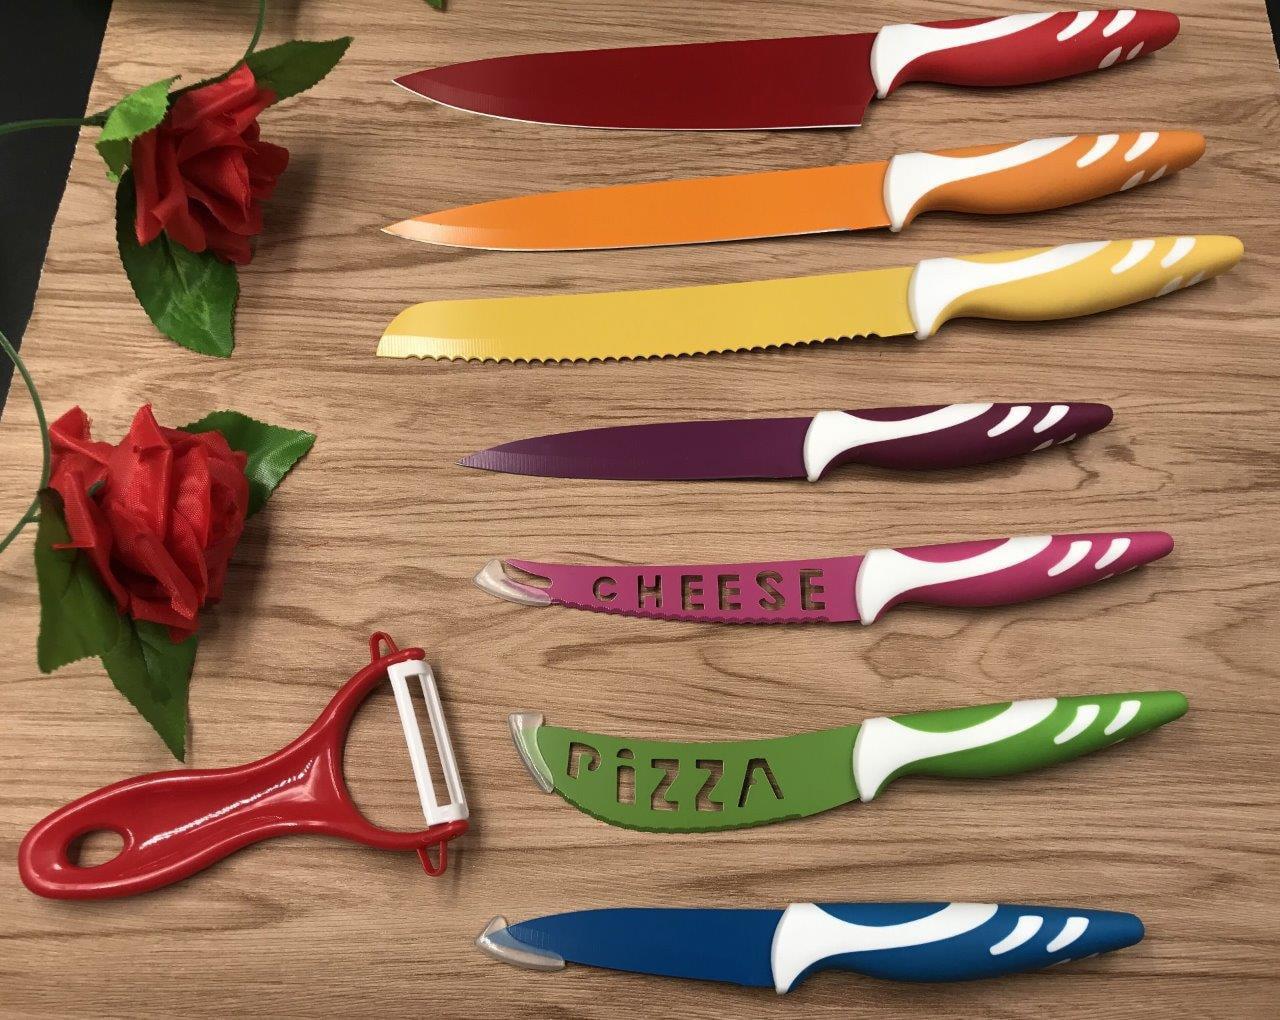 kitchen knives sets appliance bundles lightahead stainless steel 8 pcs colored set chef bread slicer